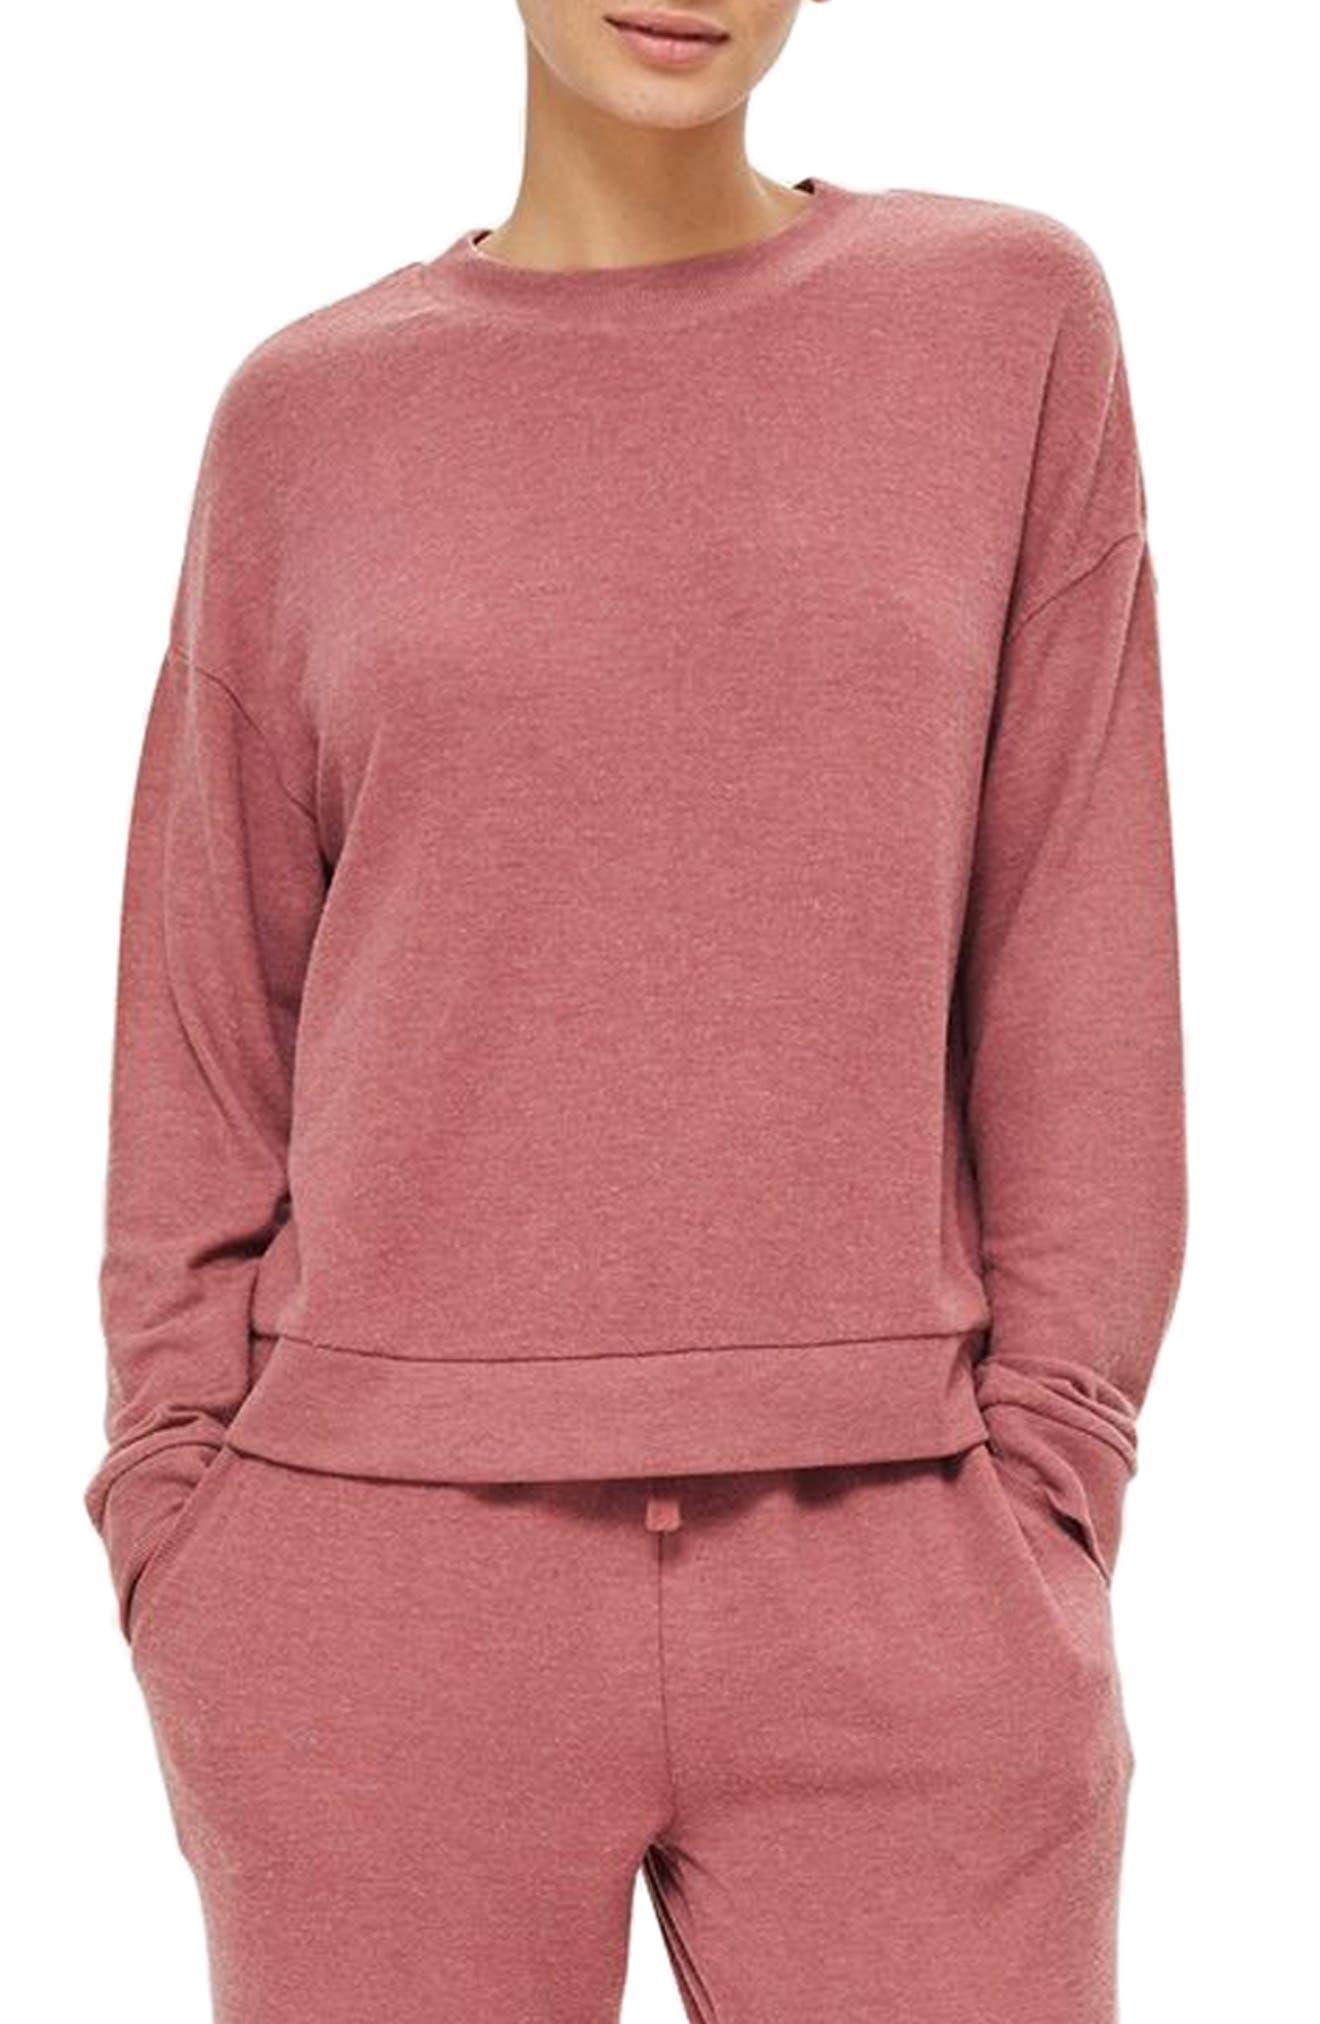 Rose Sweatshirt,                             Main thumbnail 1, color,                             650